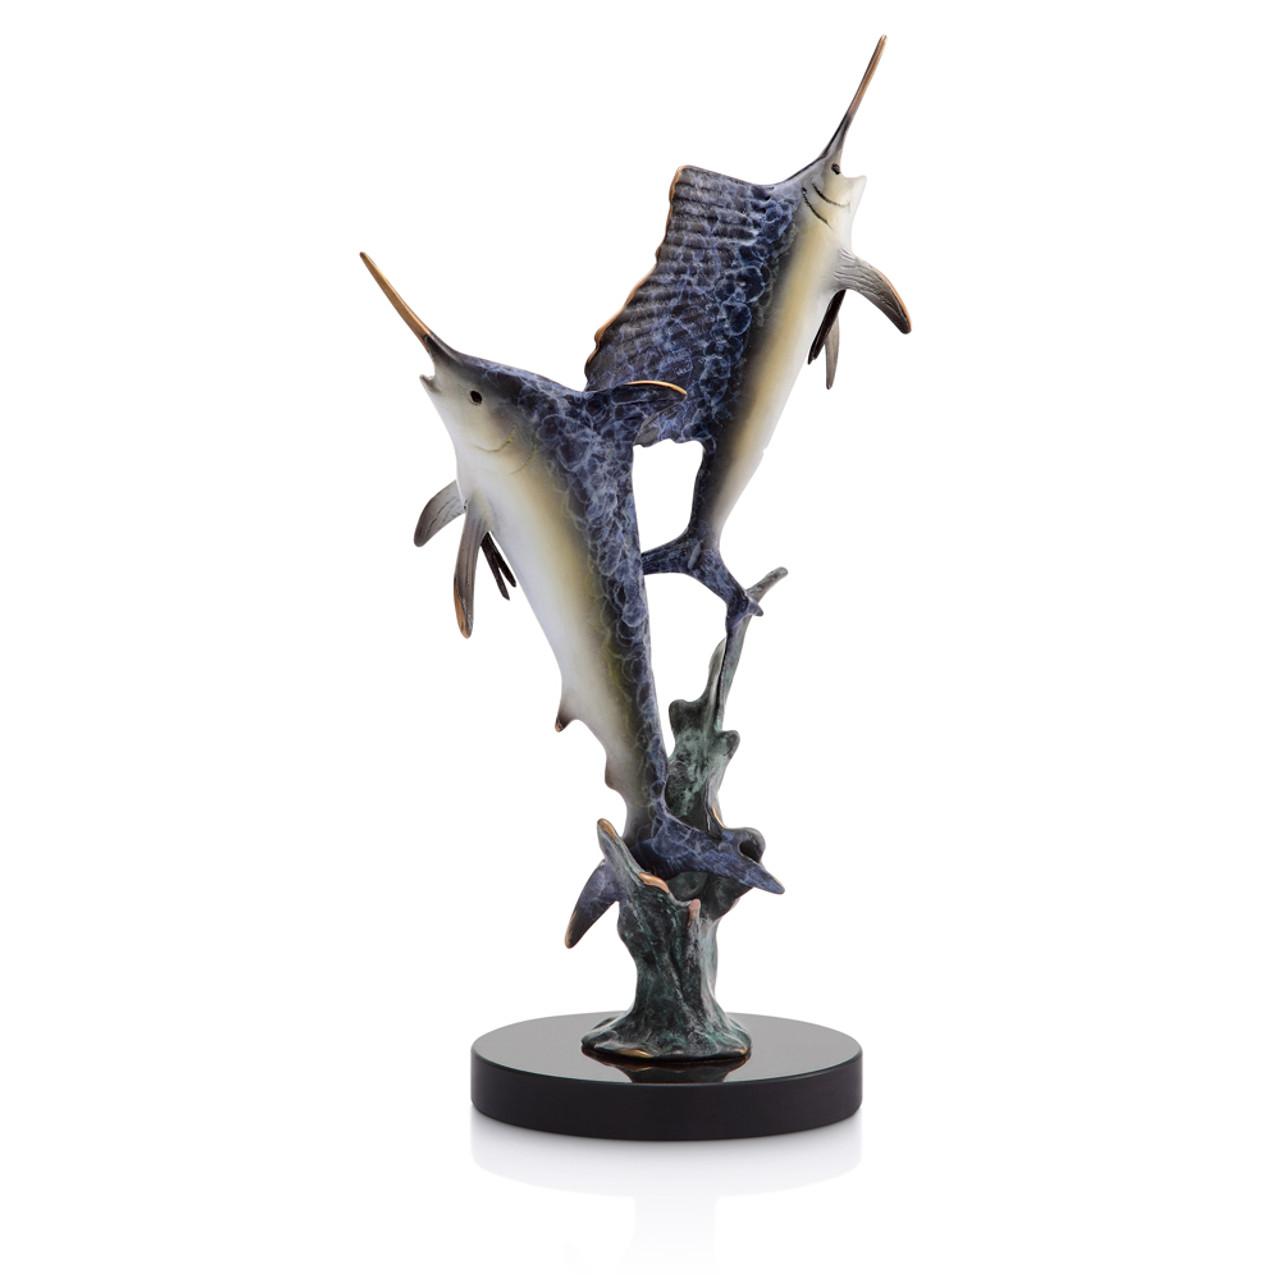 Islamorada Two Step - Marlin & Sailfish Sculpture